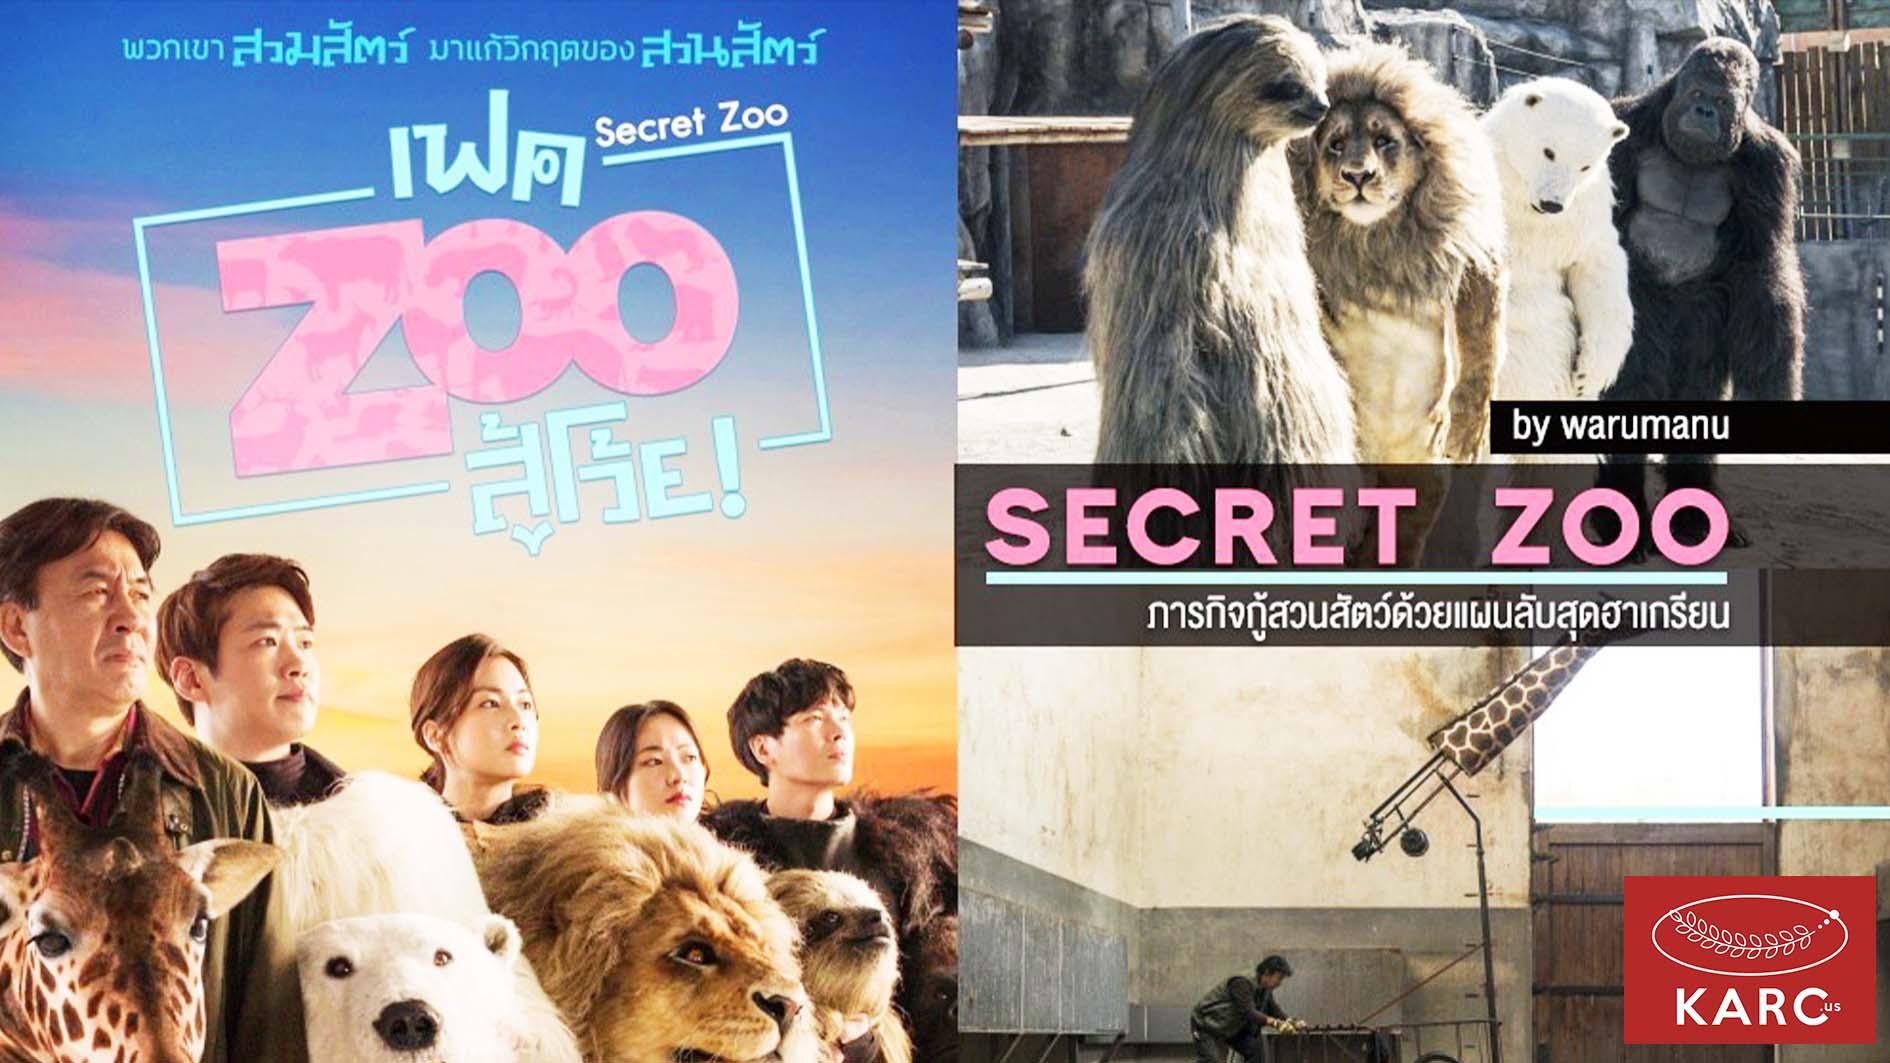 Secret Zoo 2020 ภาพยนตร์ตลก พล็อตน่าสนใจ - Karc.us